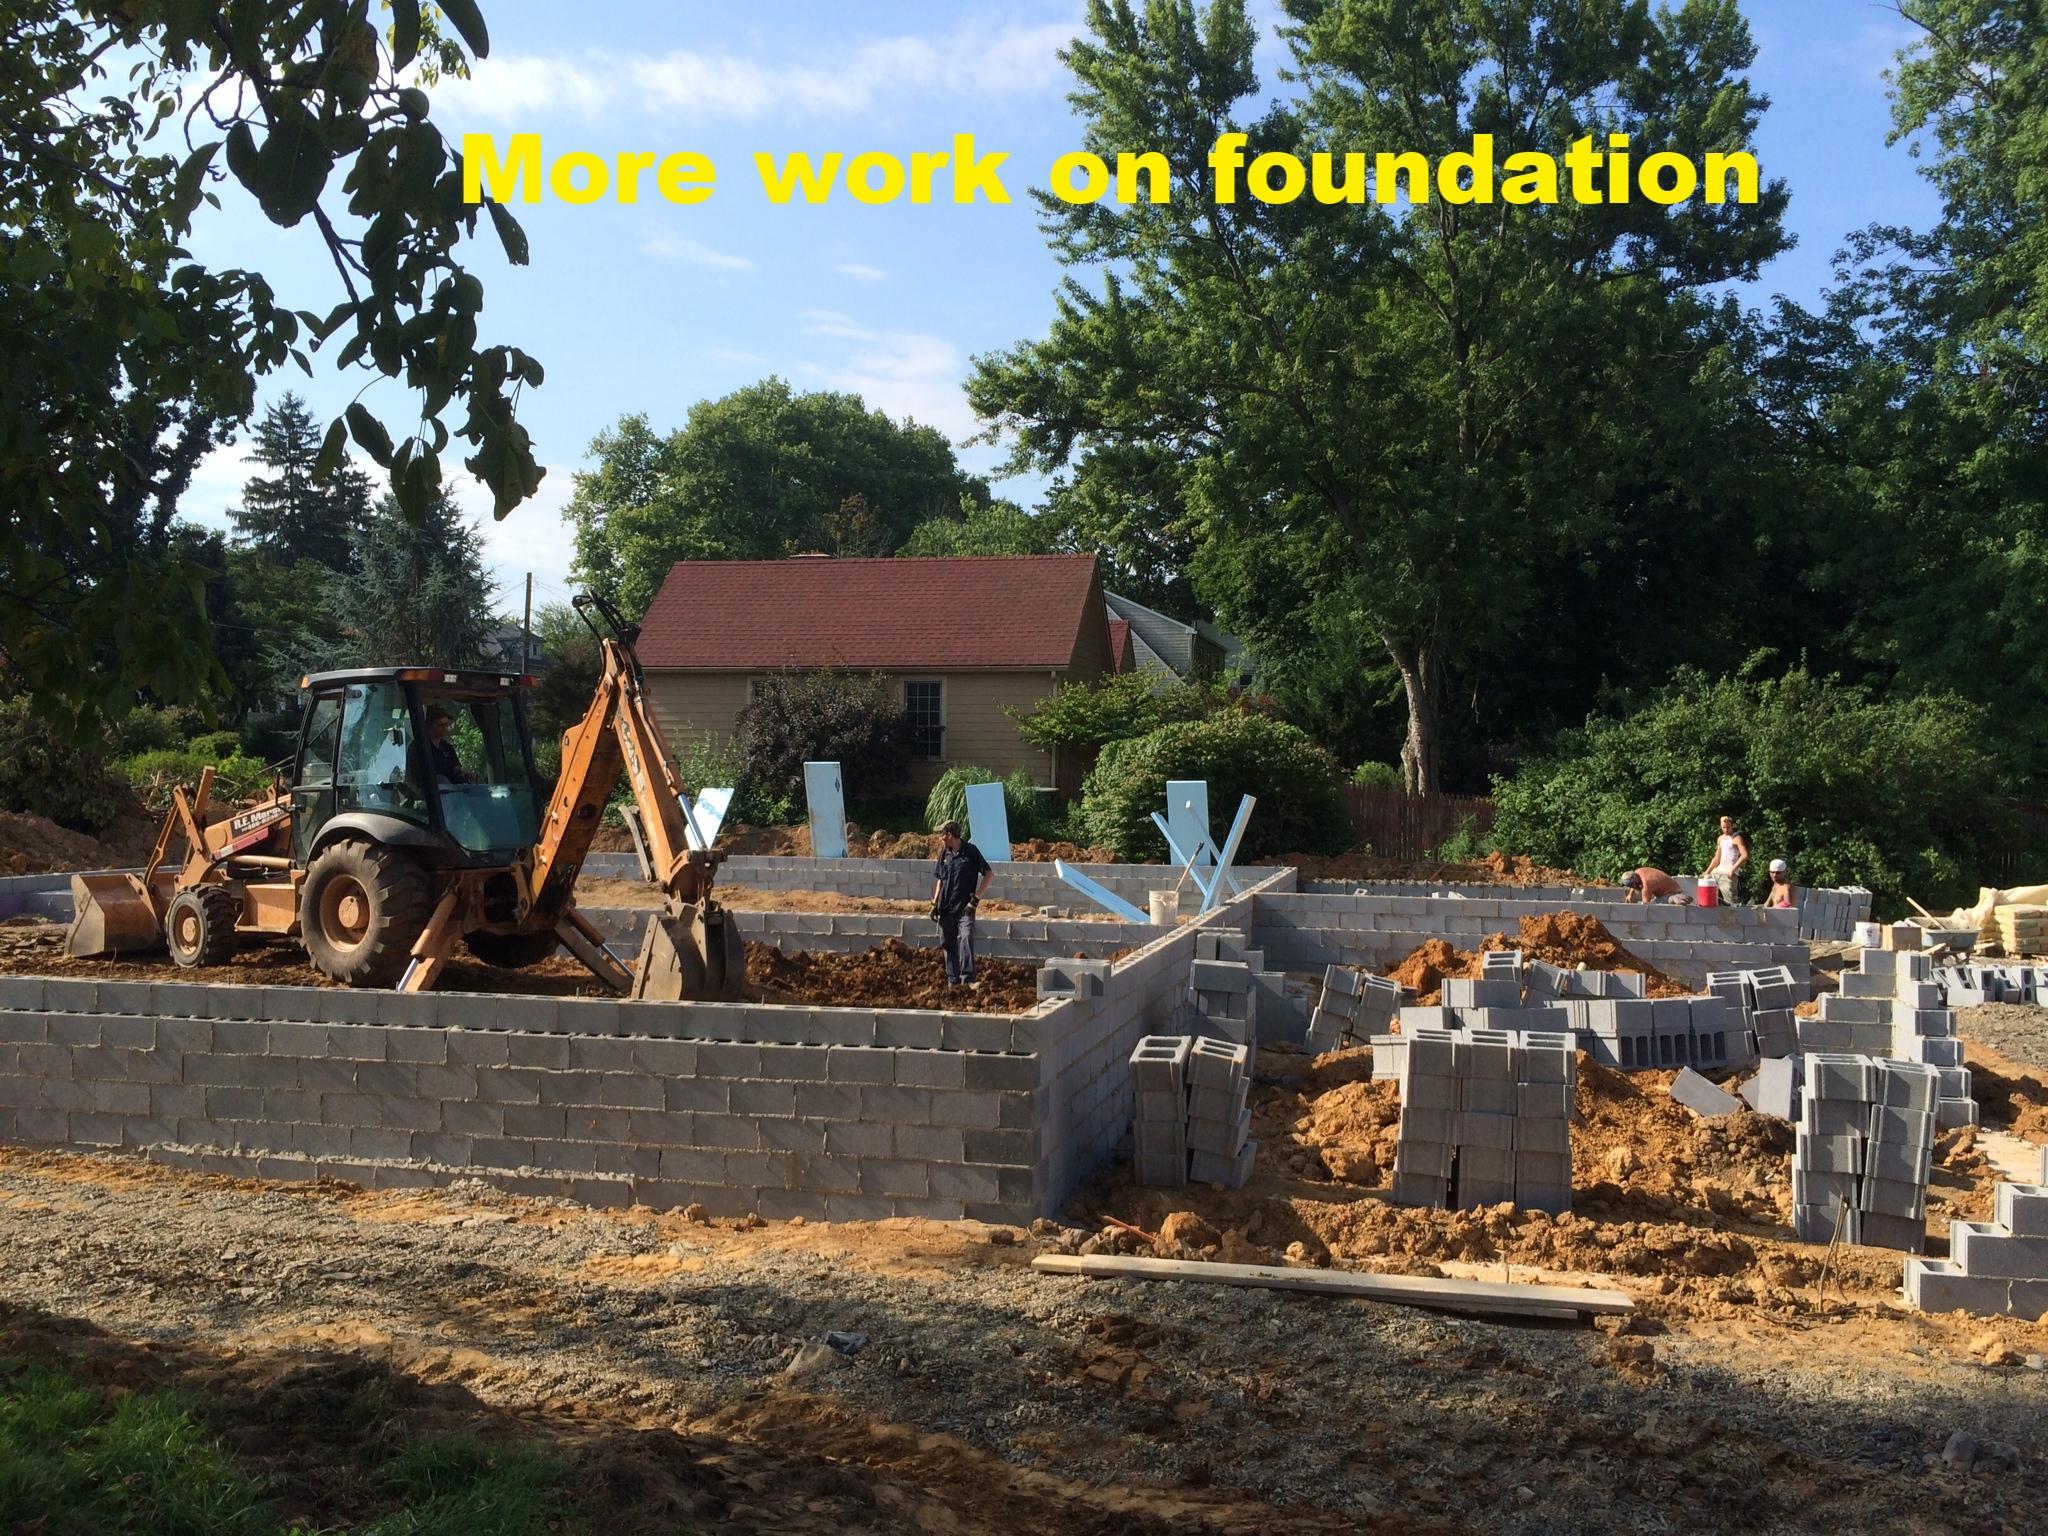 07.18.17_foundation work 2.JPG